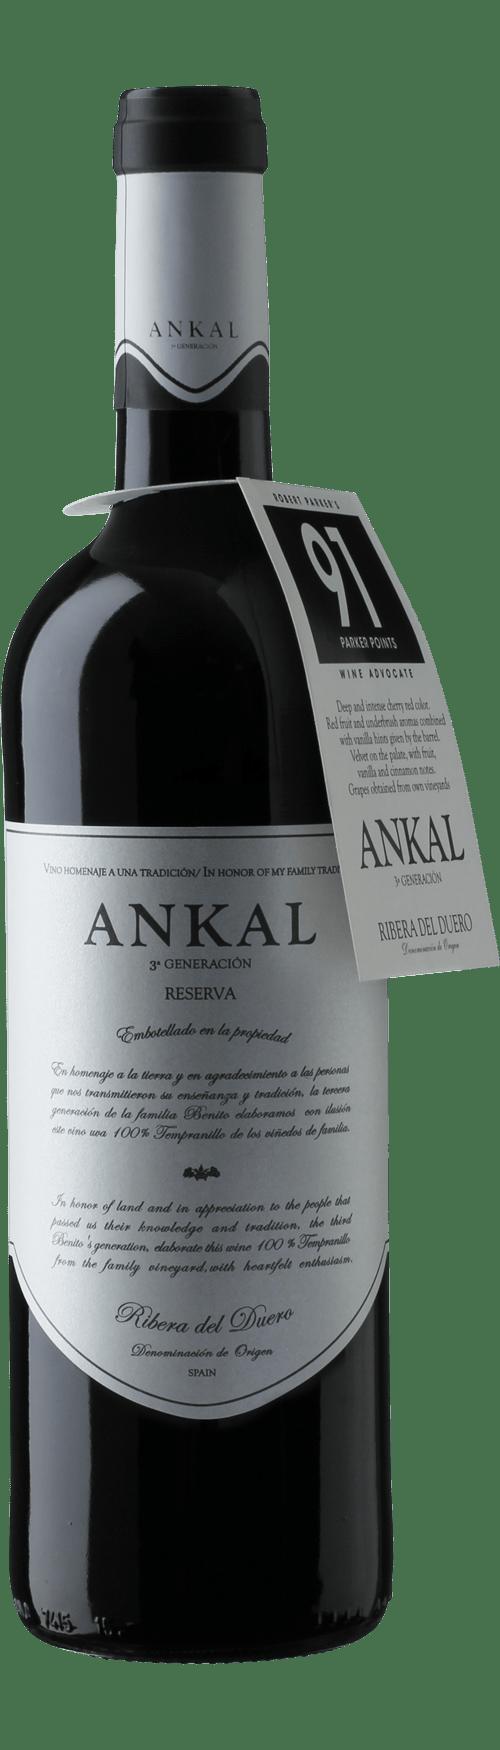 Ankal Reserva Ribera del Duero